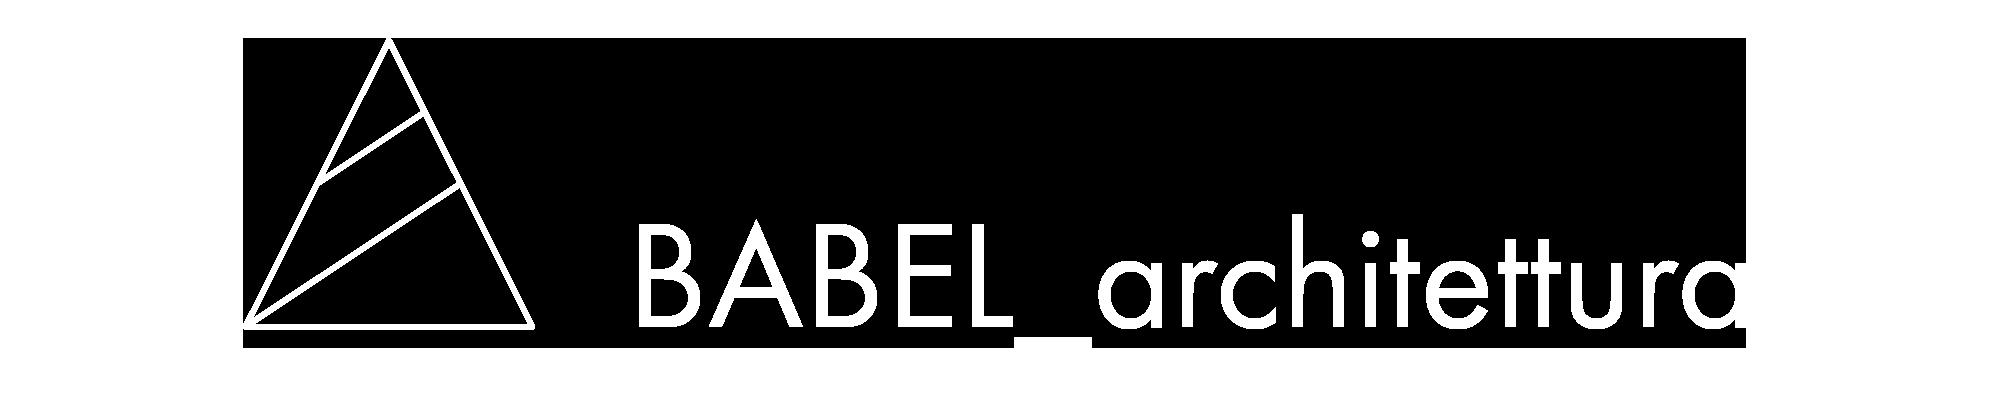 Babel Architettura